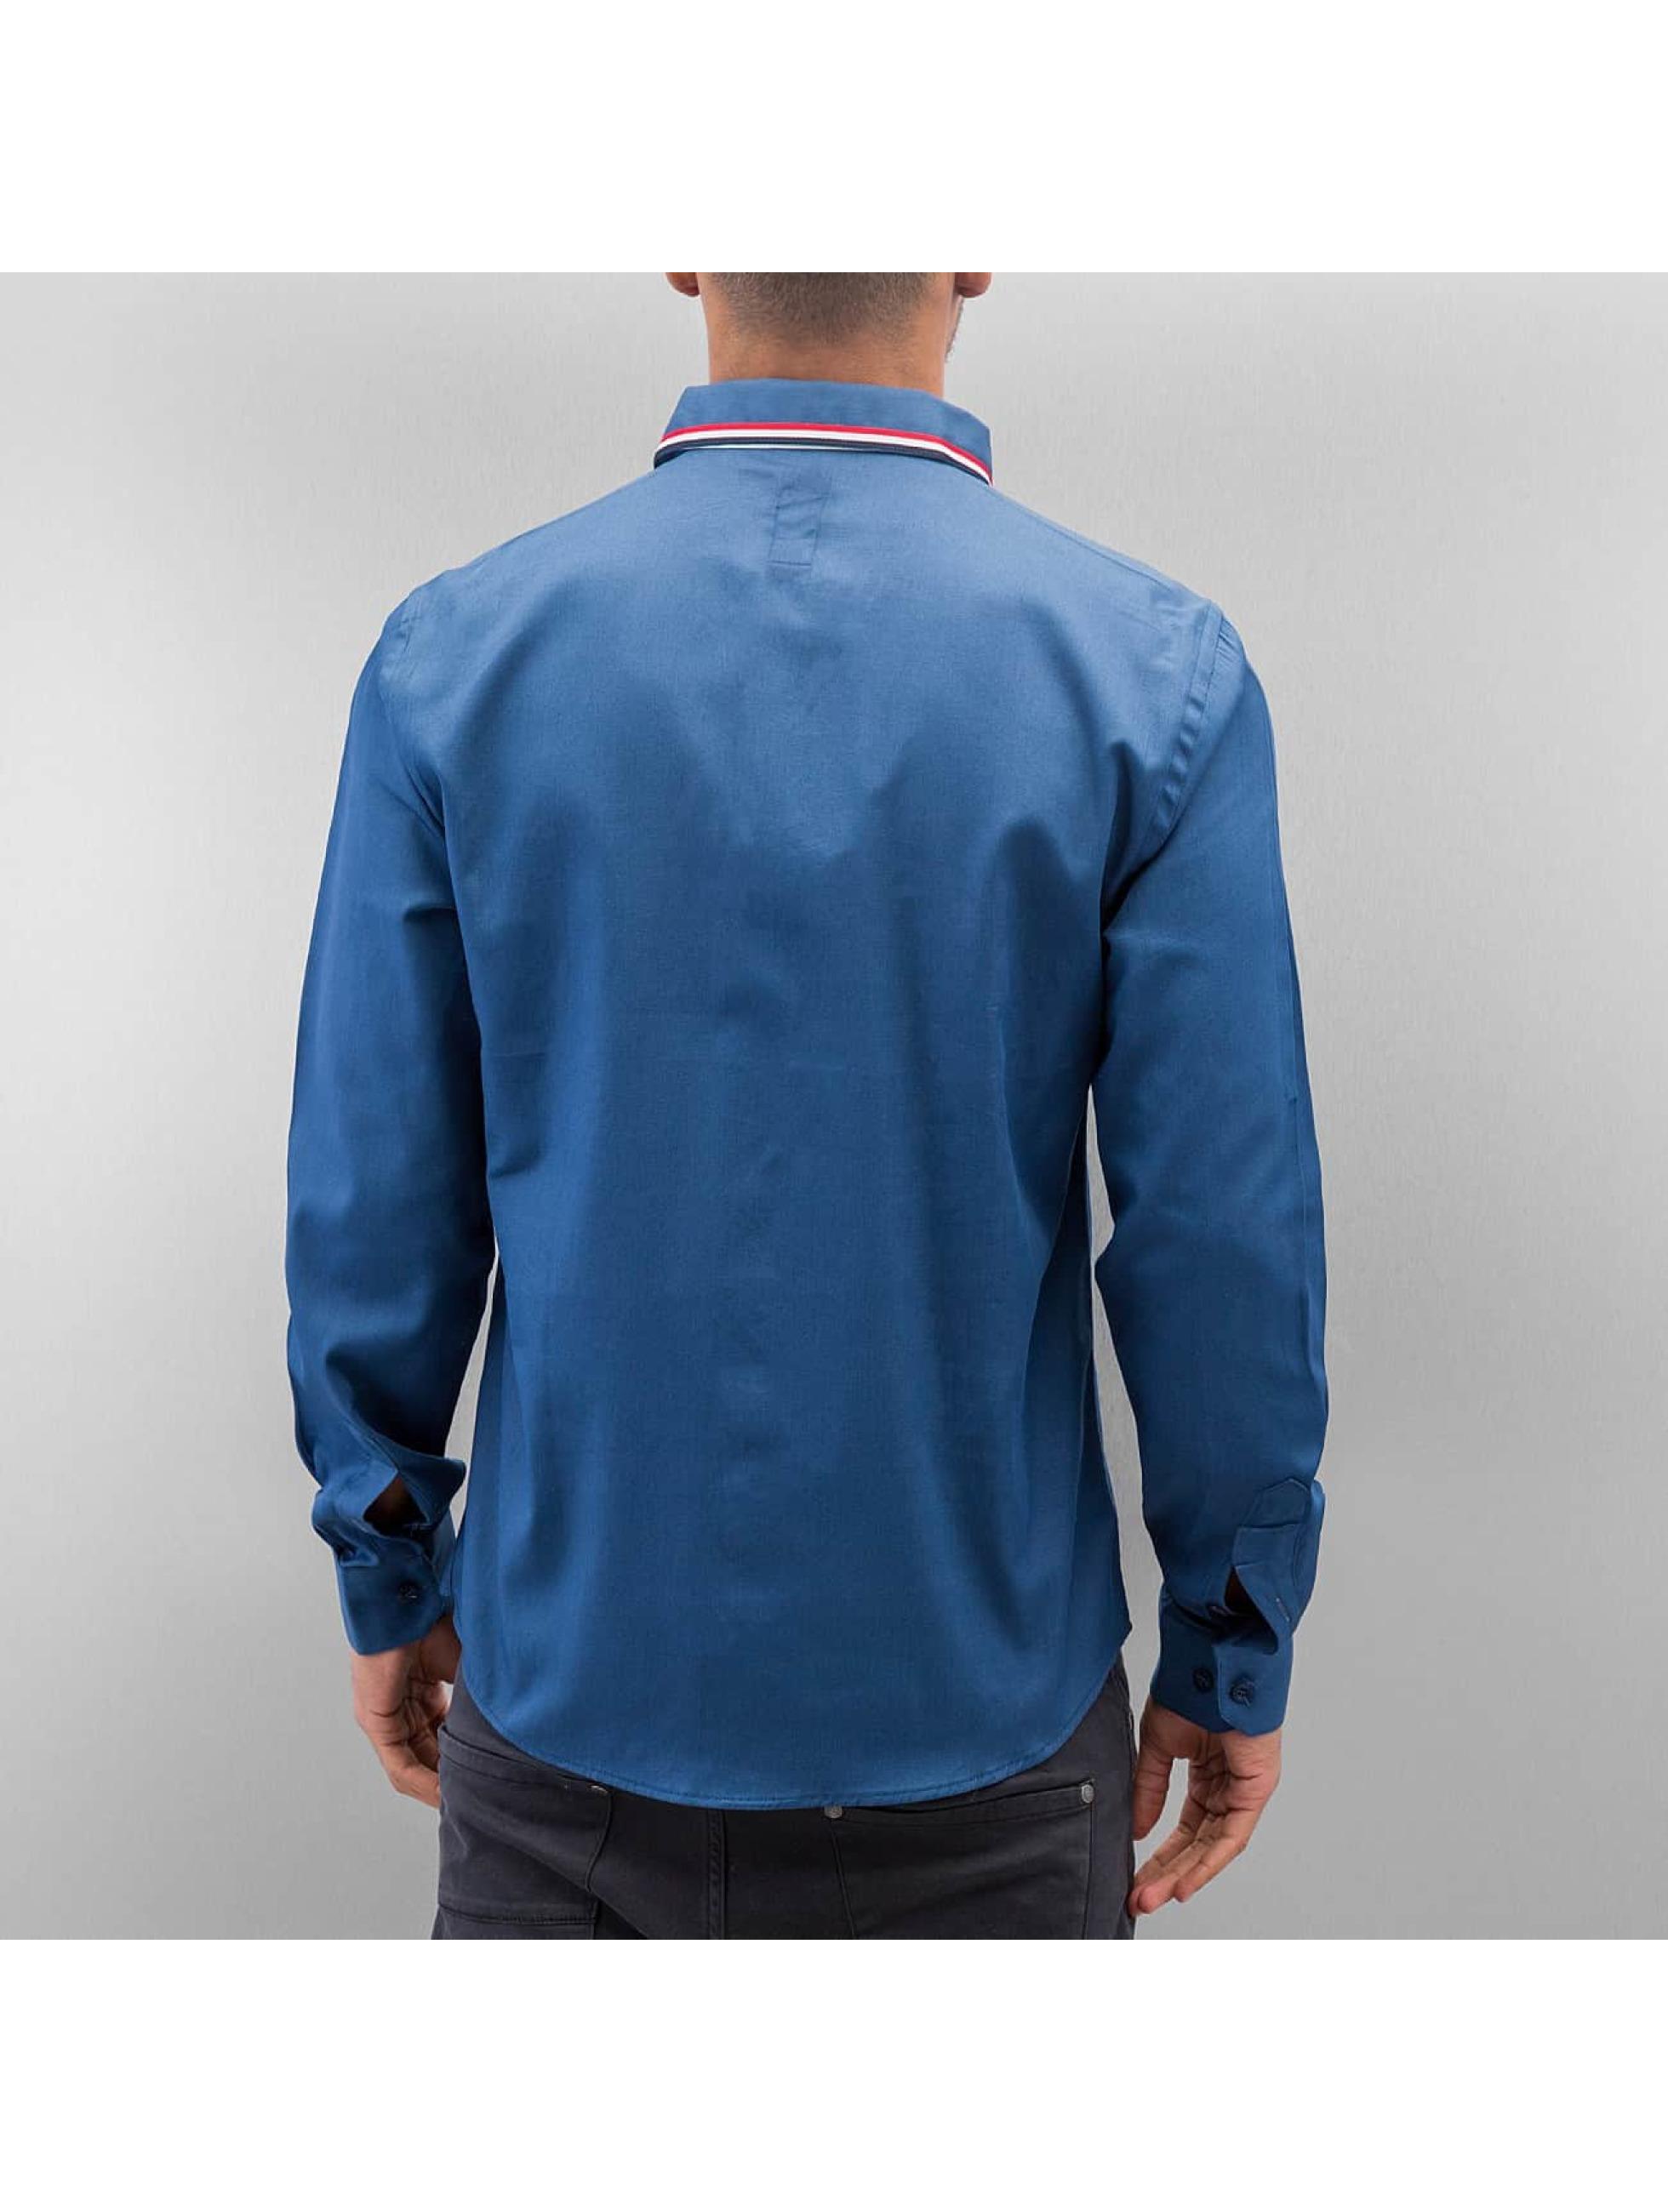 Cazzy Clang overhemd Renjo blauw